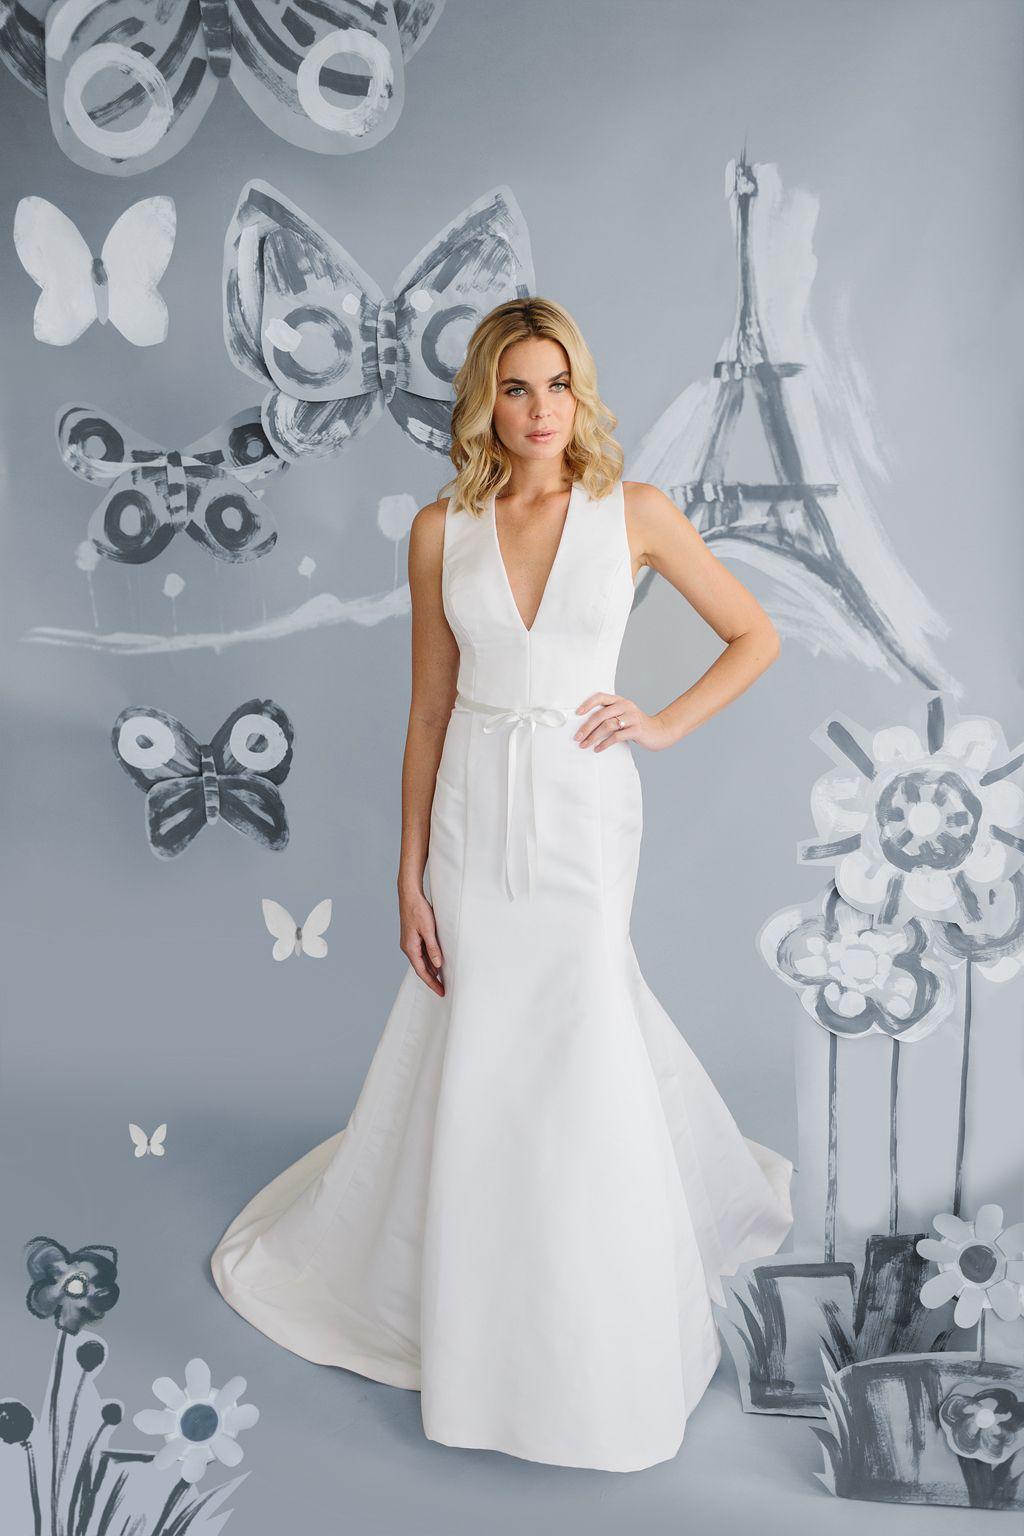 Kate Mcdonald Bridal Amelie Wedding Dress Le Papillon Collection 2018 Modern Bridal Gowns Minimalist Wedding Dresses Lulakate Bridesmaid Dresses [ 1536 x 1024 Pixel ]